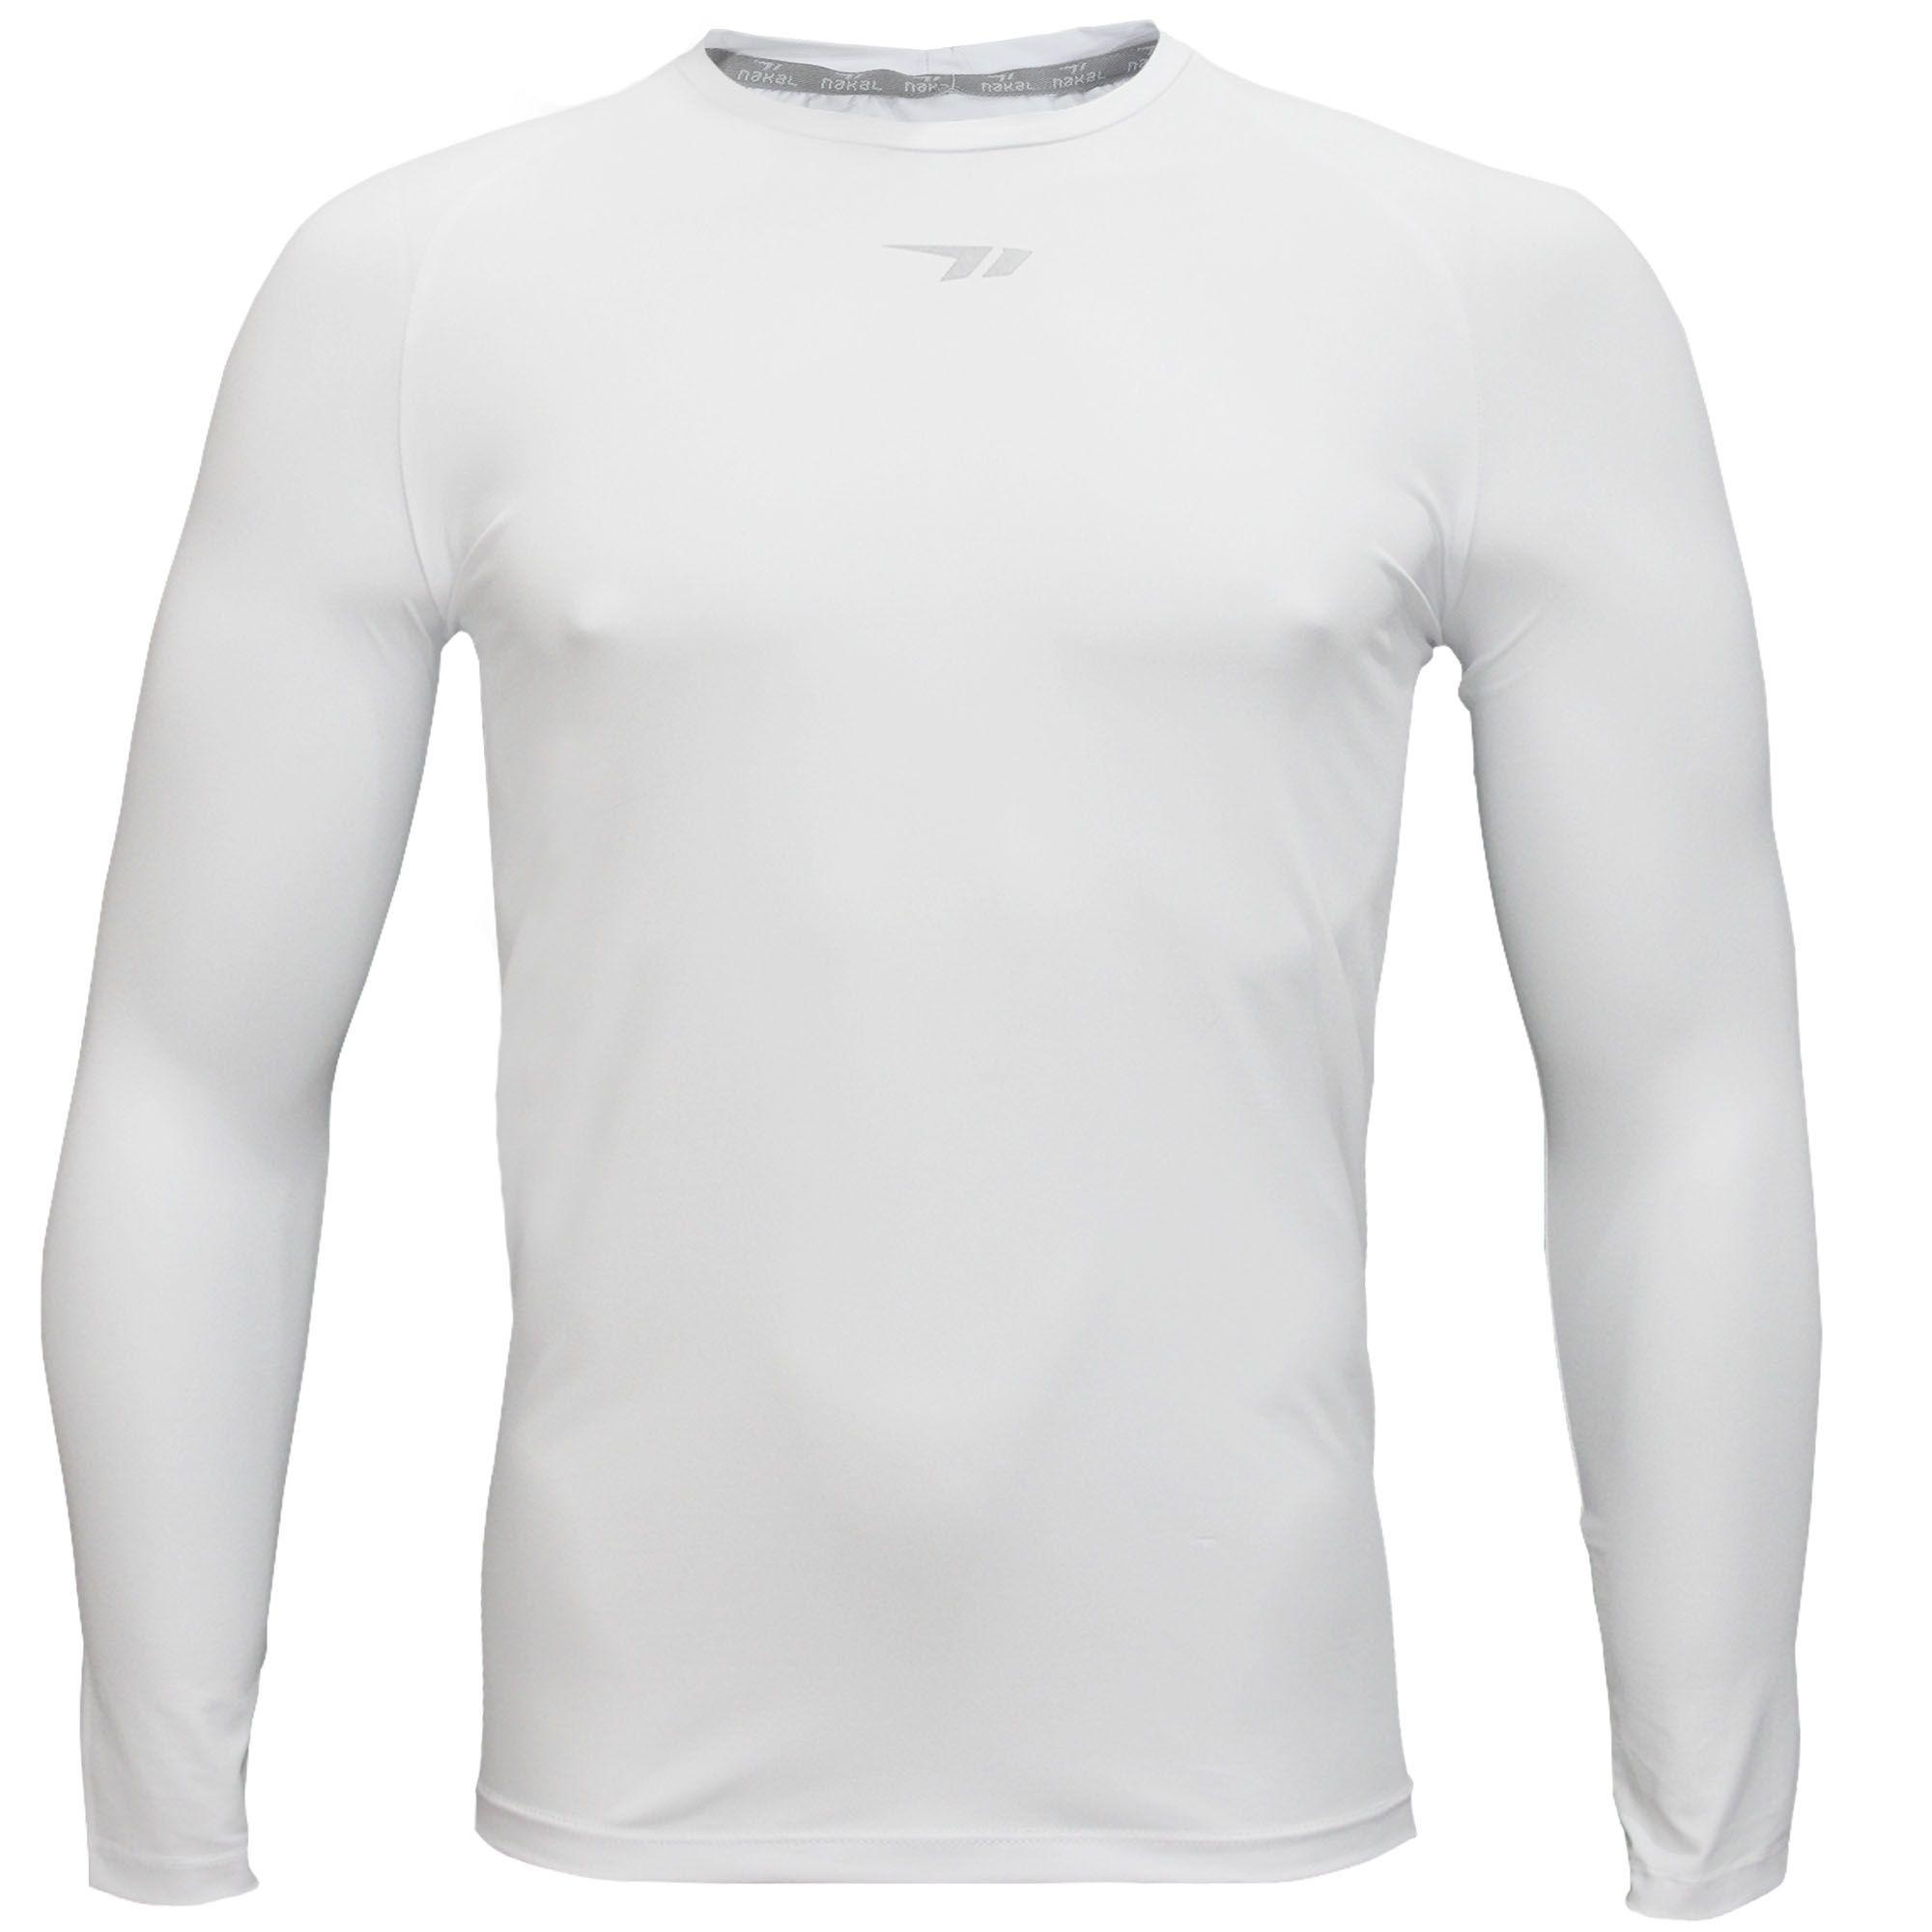 Camisa Nakal Compressão ML Poliamida Branca